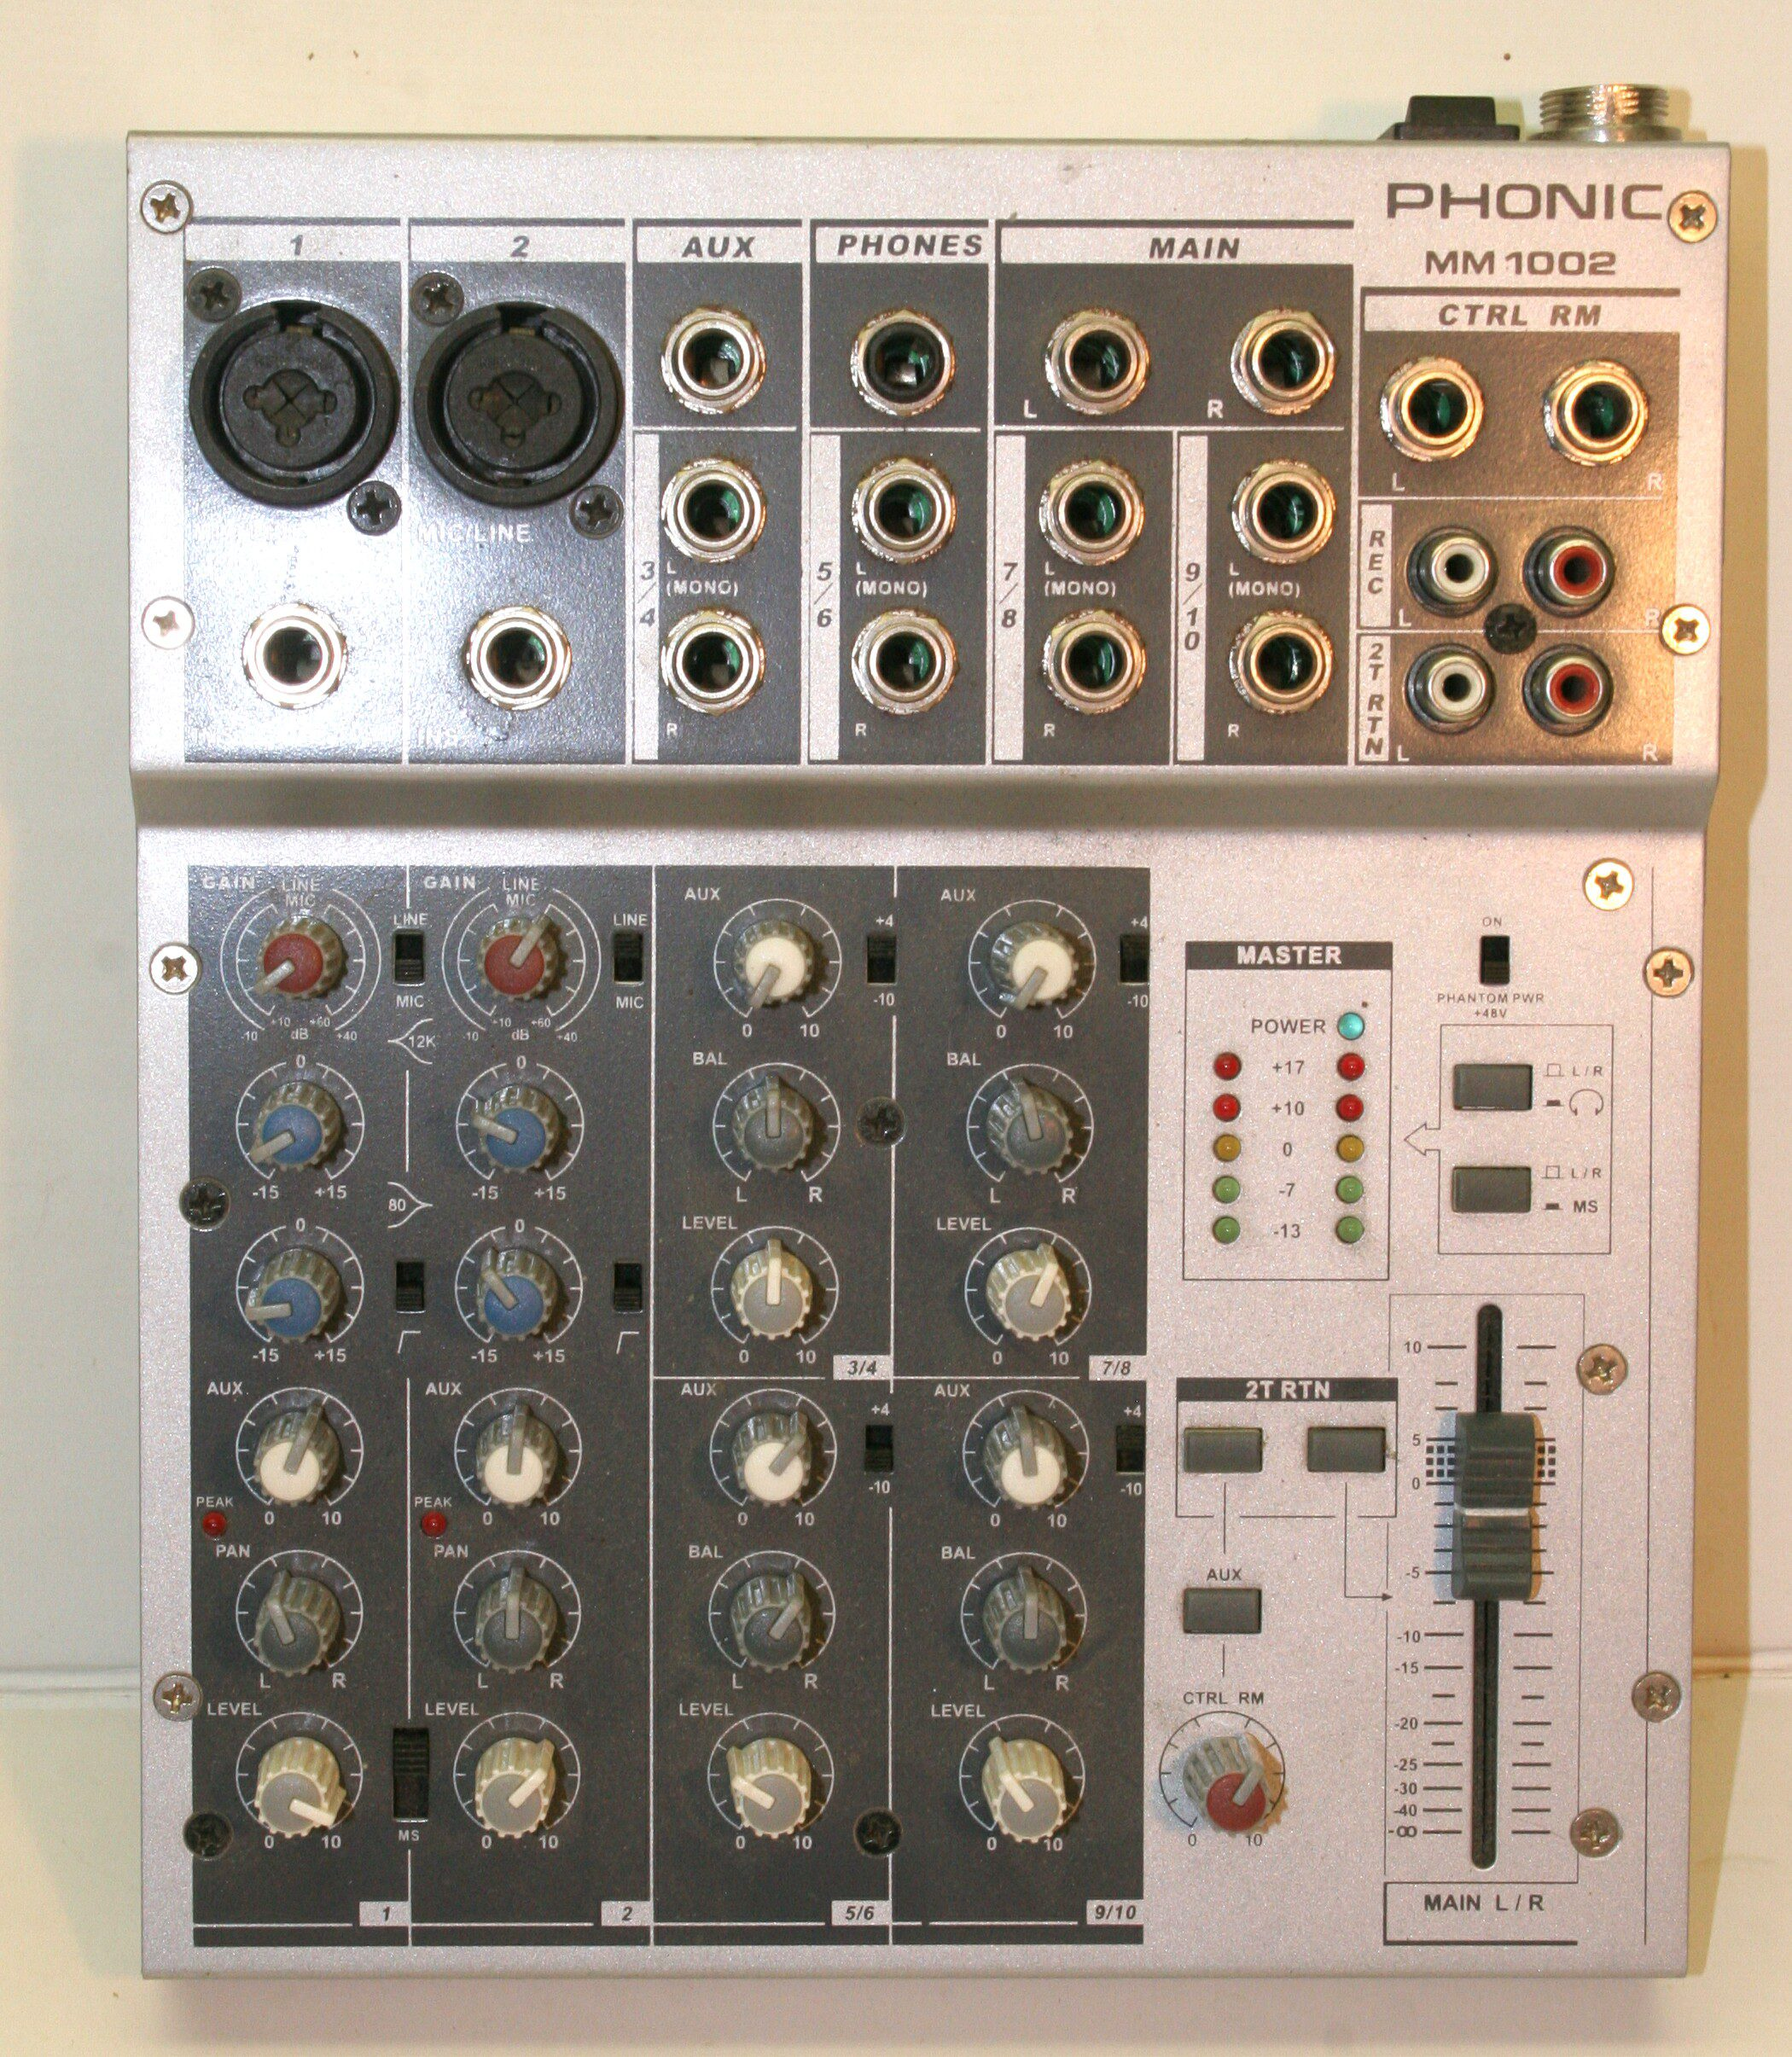 (Mixer) Phonic MM1002